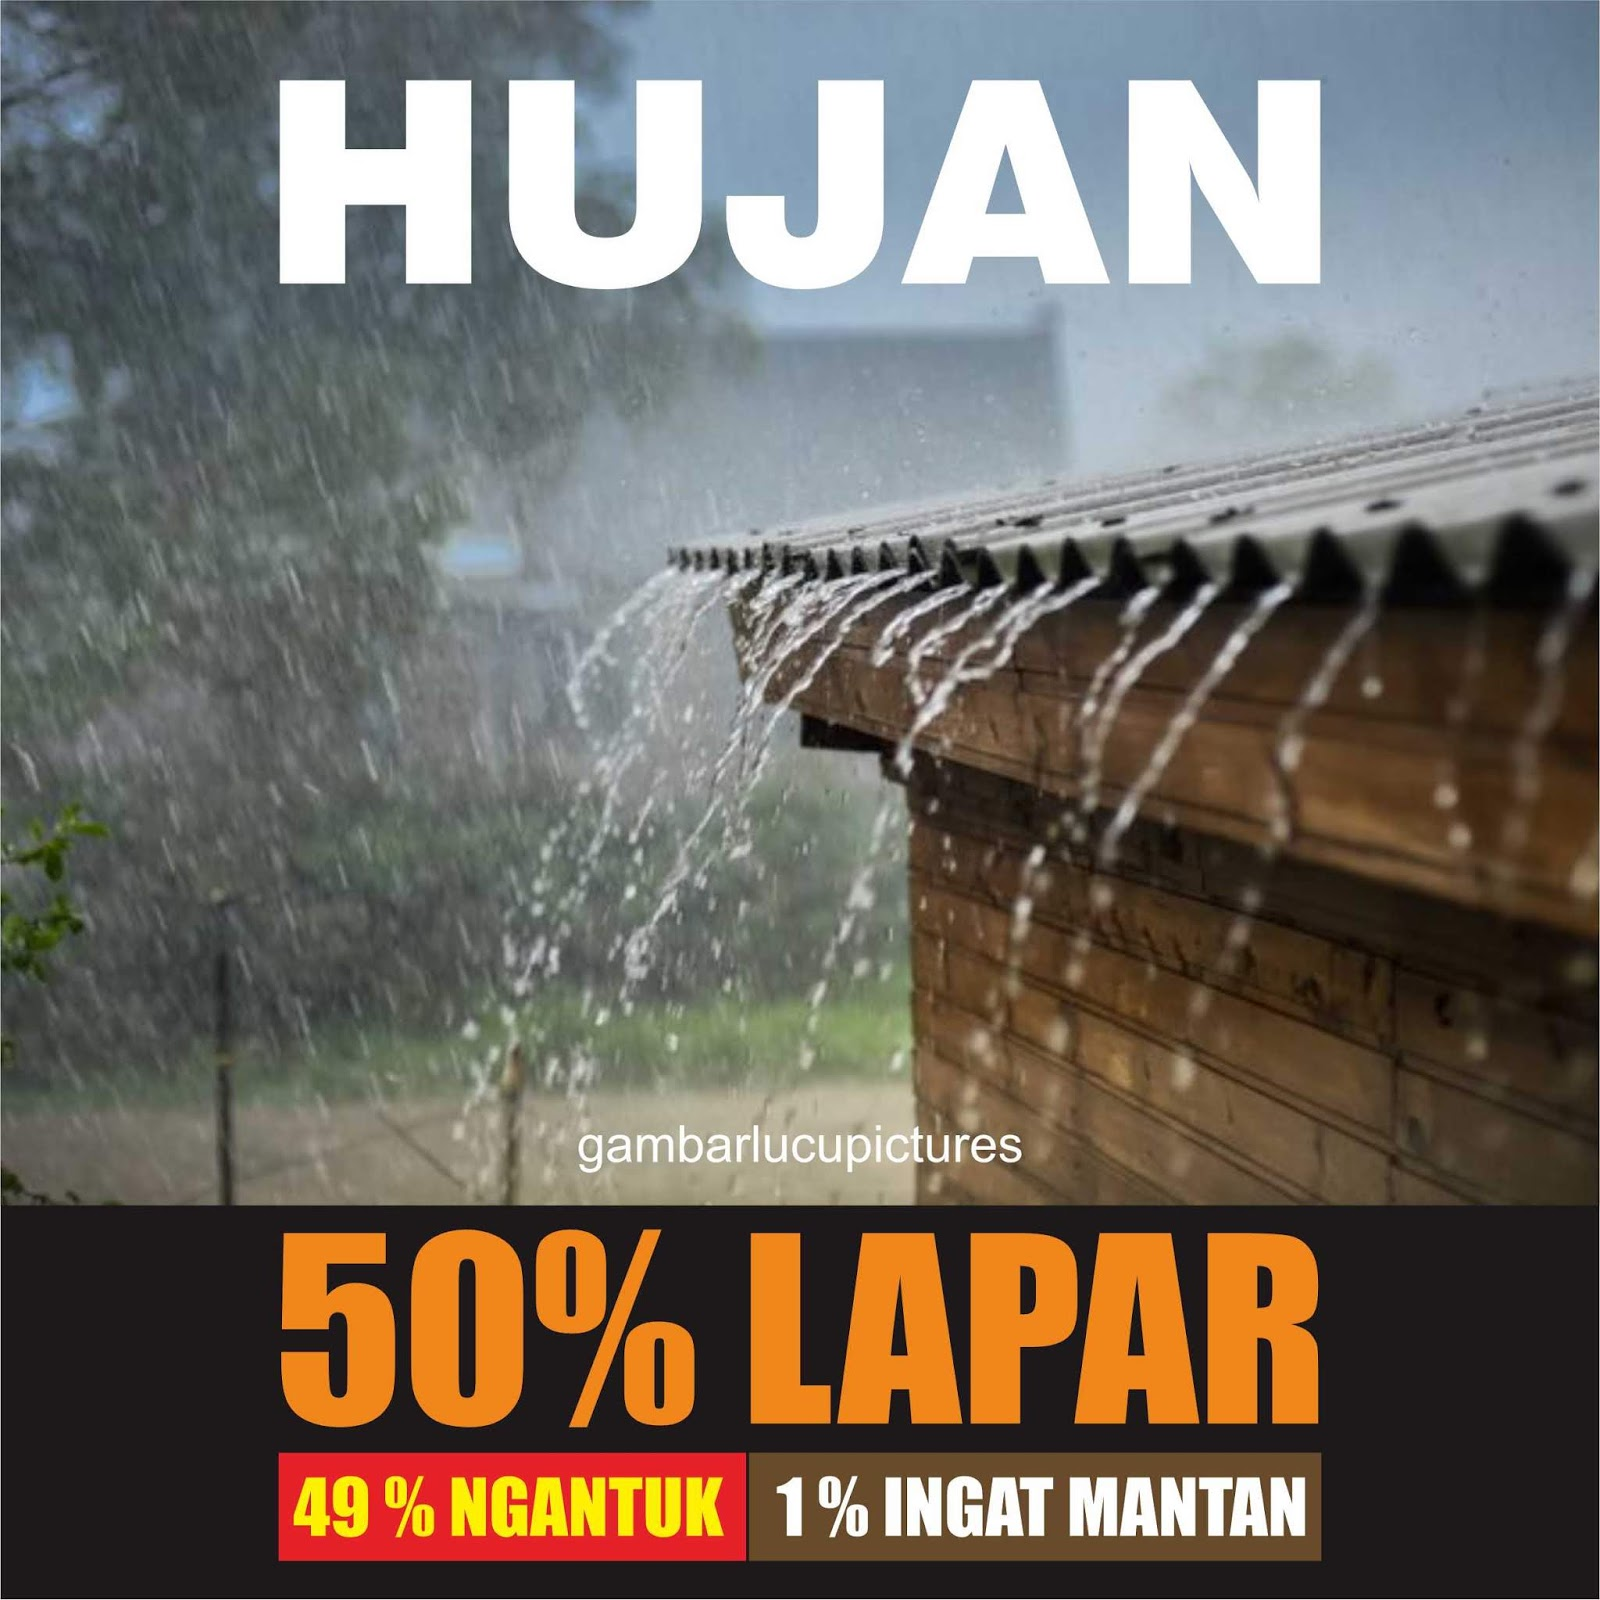 Gambar Lucu Sunda Usum Hujan